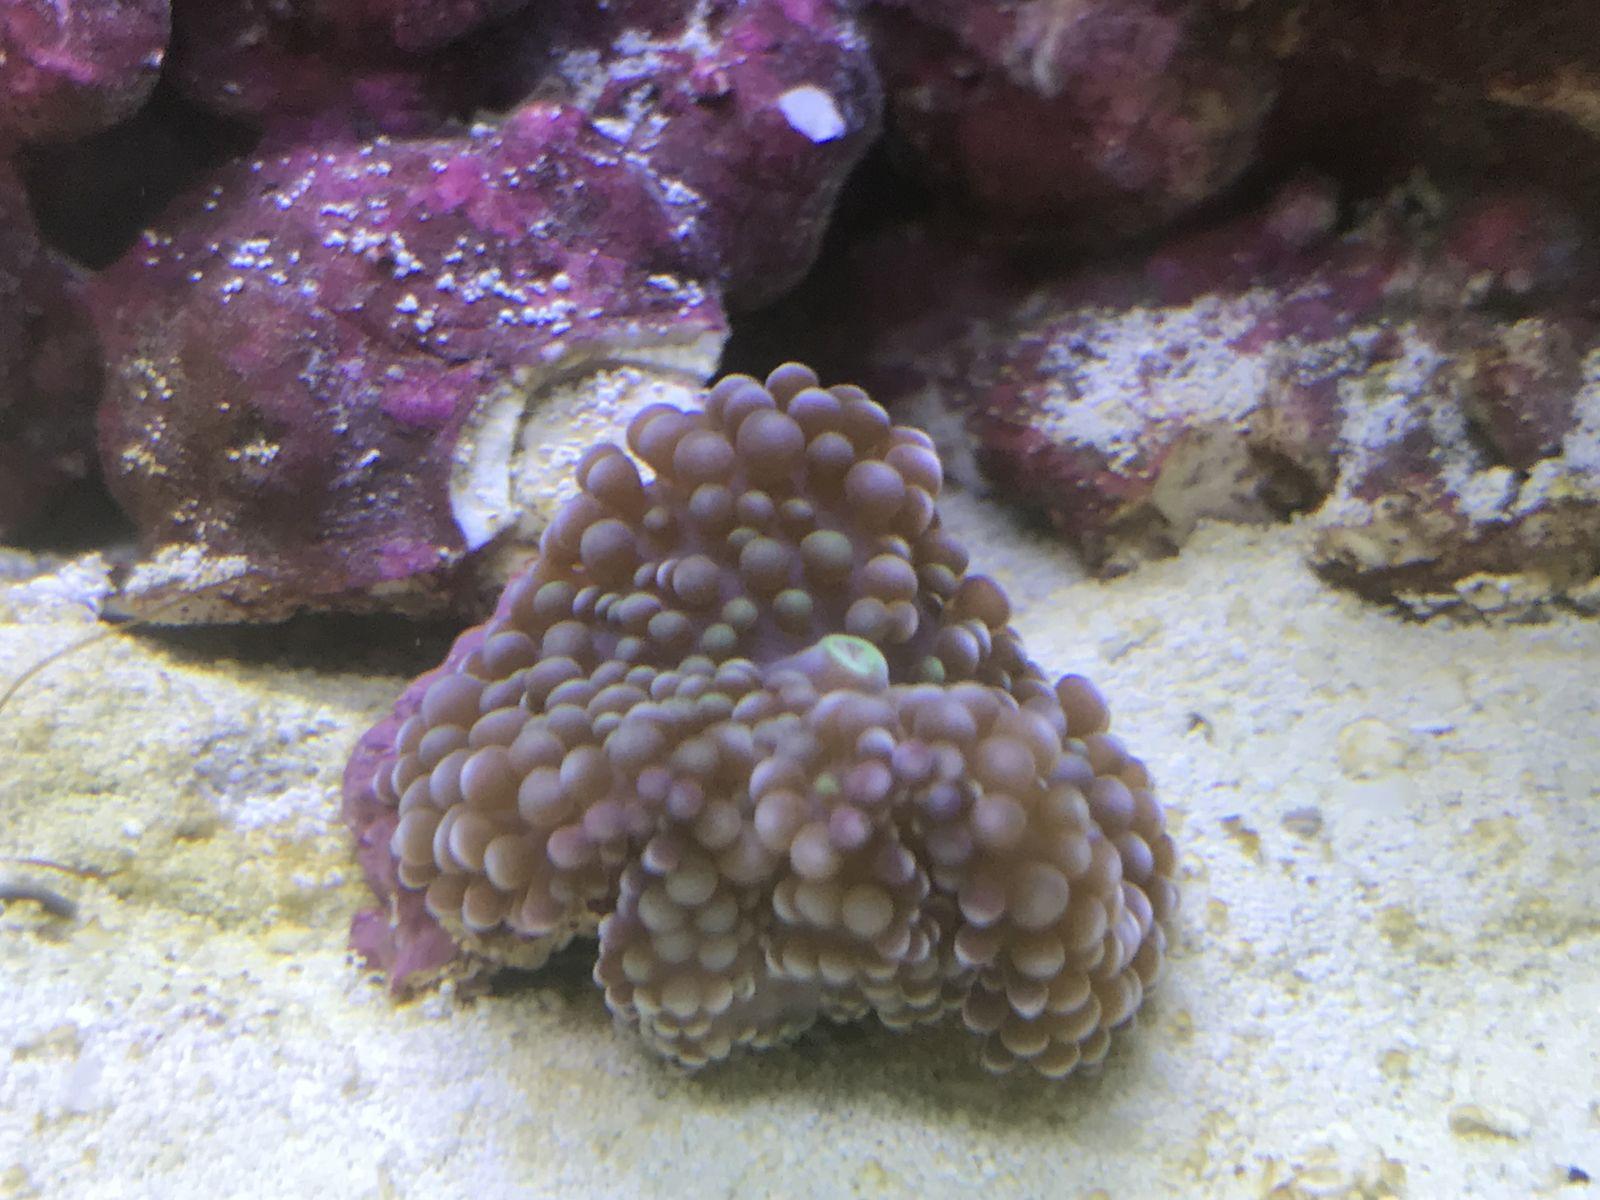 coral identification identification forum nano reef com community